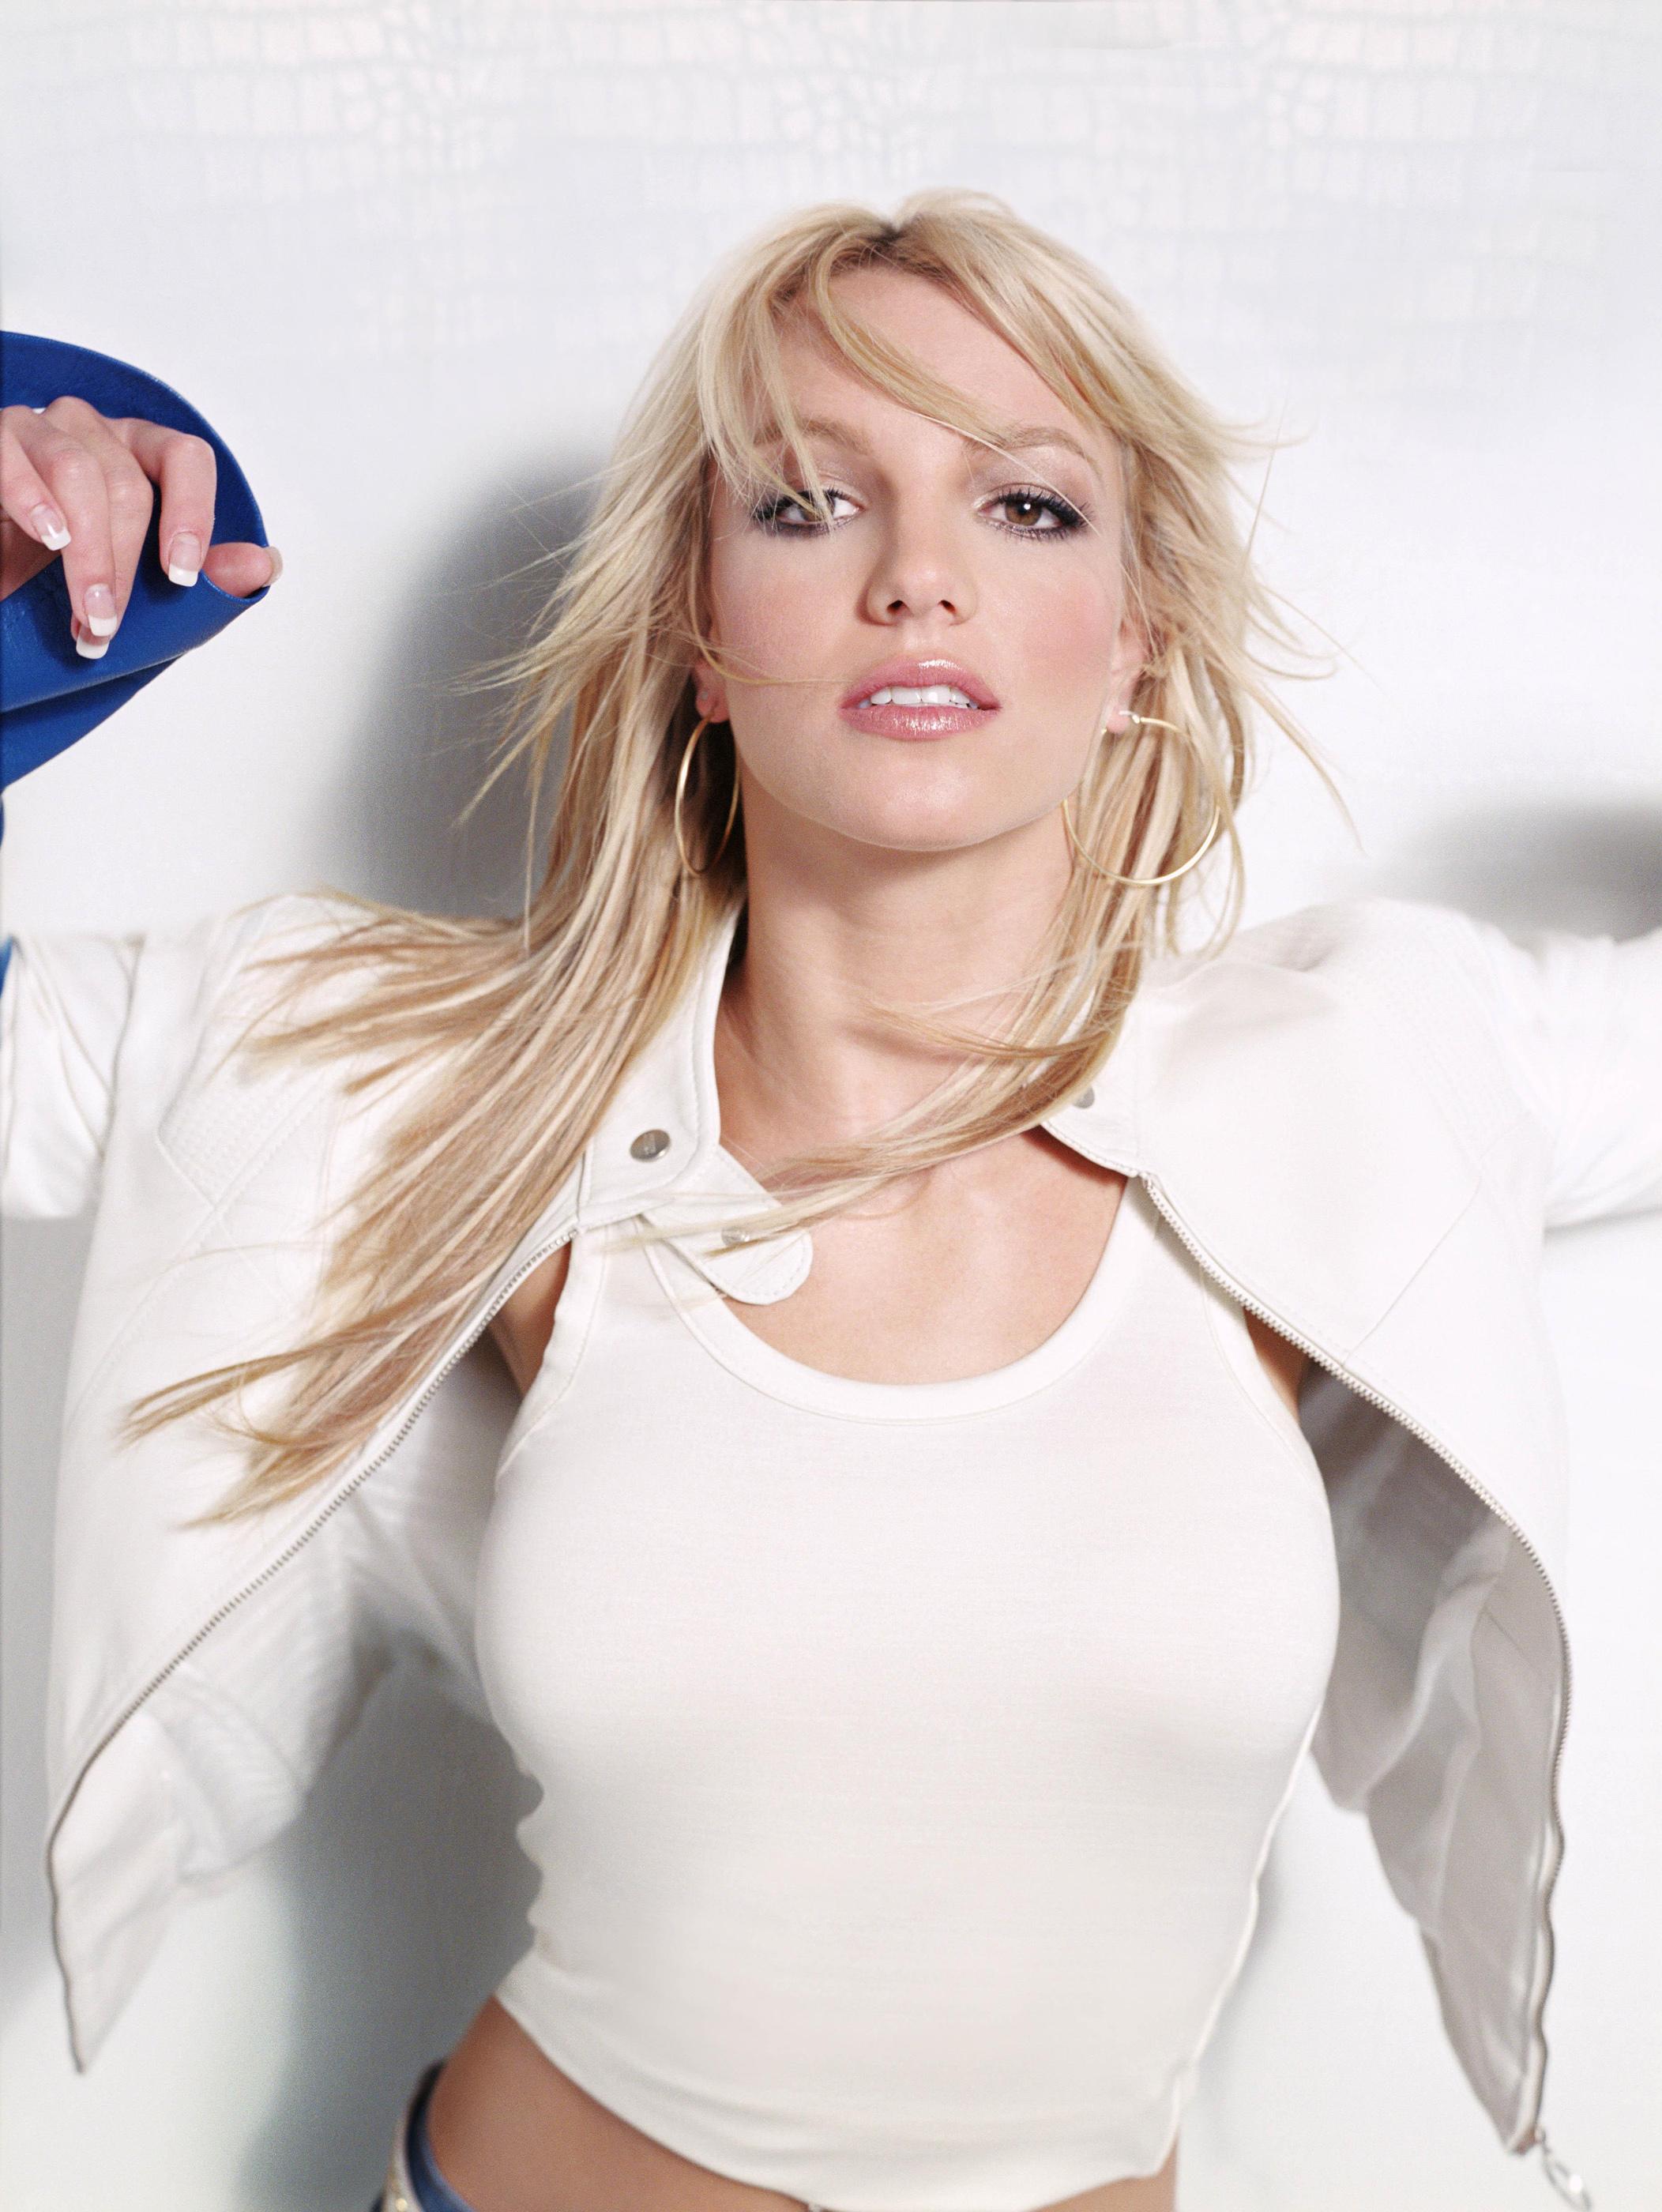 Britney spears 2 essay